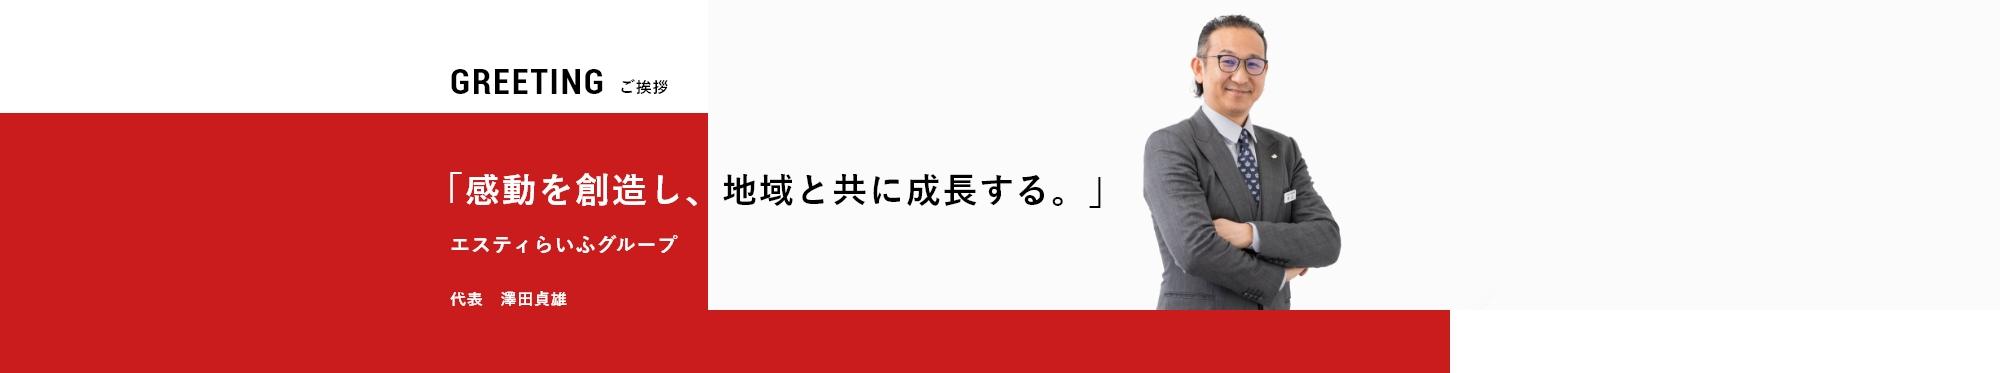 GREETING 「感動を創造し、地域と共に成長する。」  ご挨拶 エスティらいふグループ 代表 澤田貞雄